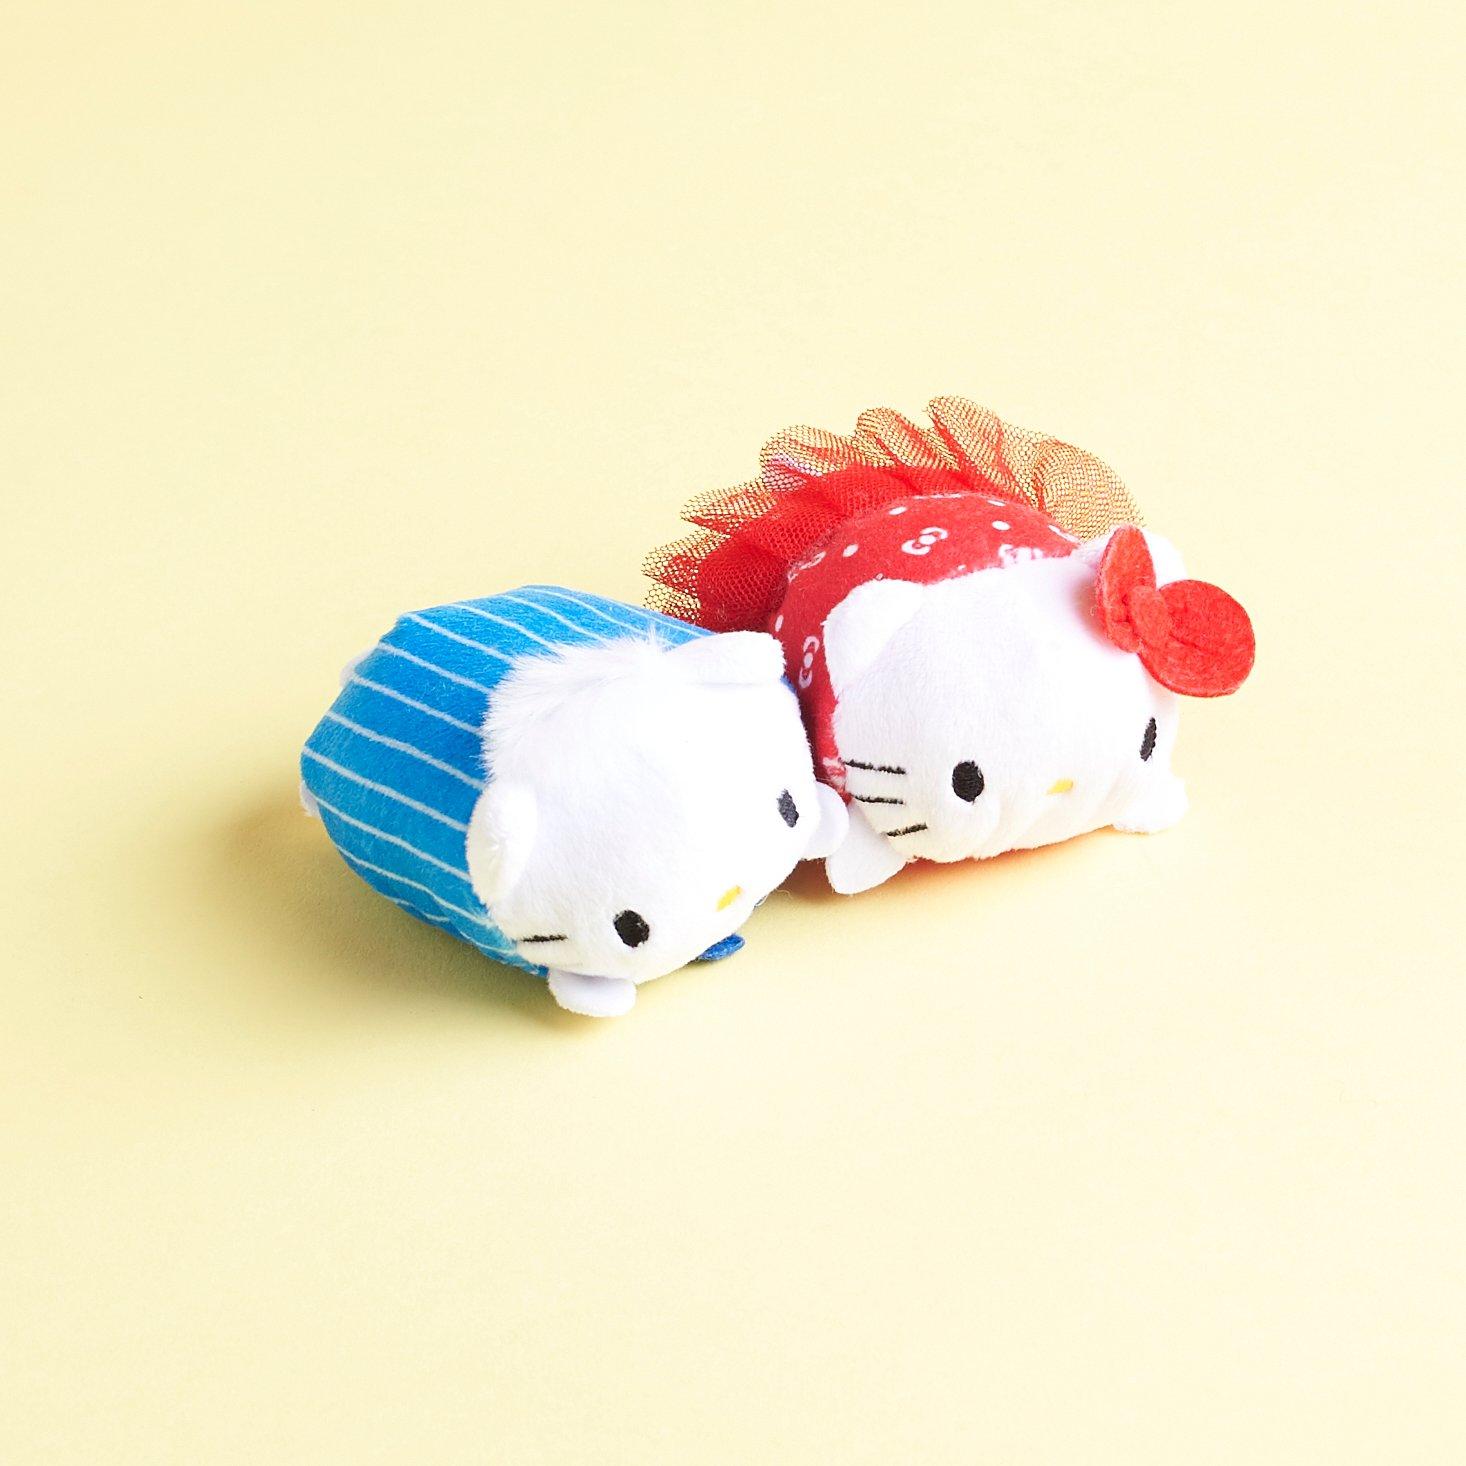 Sanrio-small-gift-crate-friendship-2017-0019